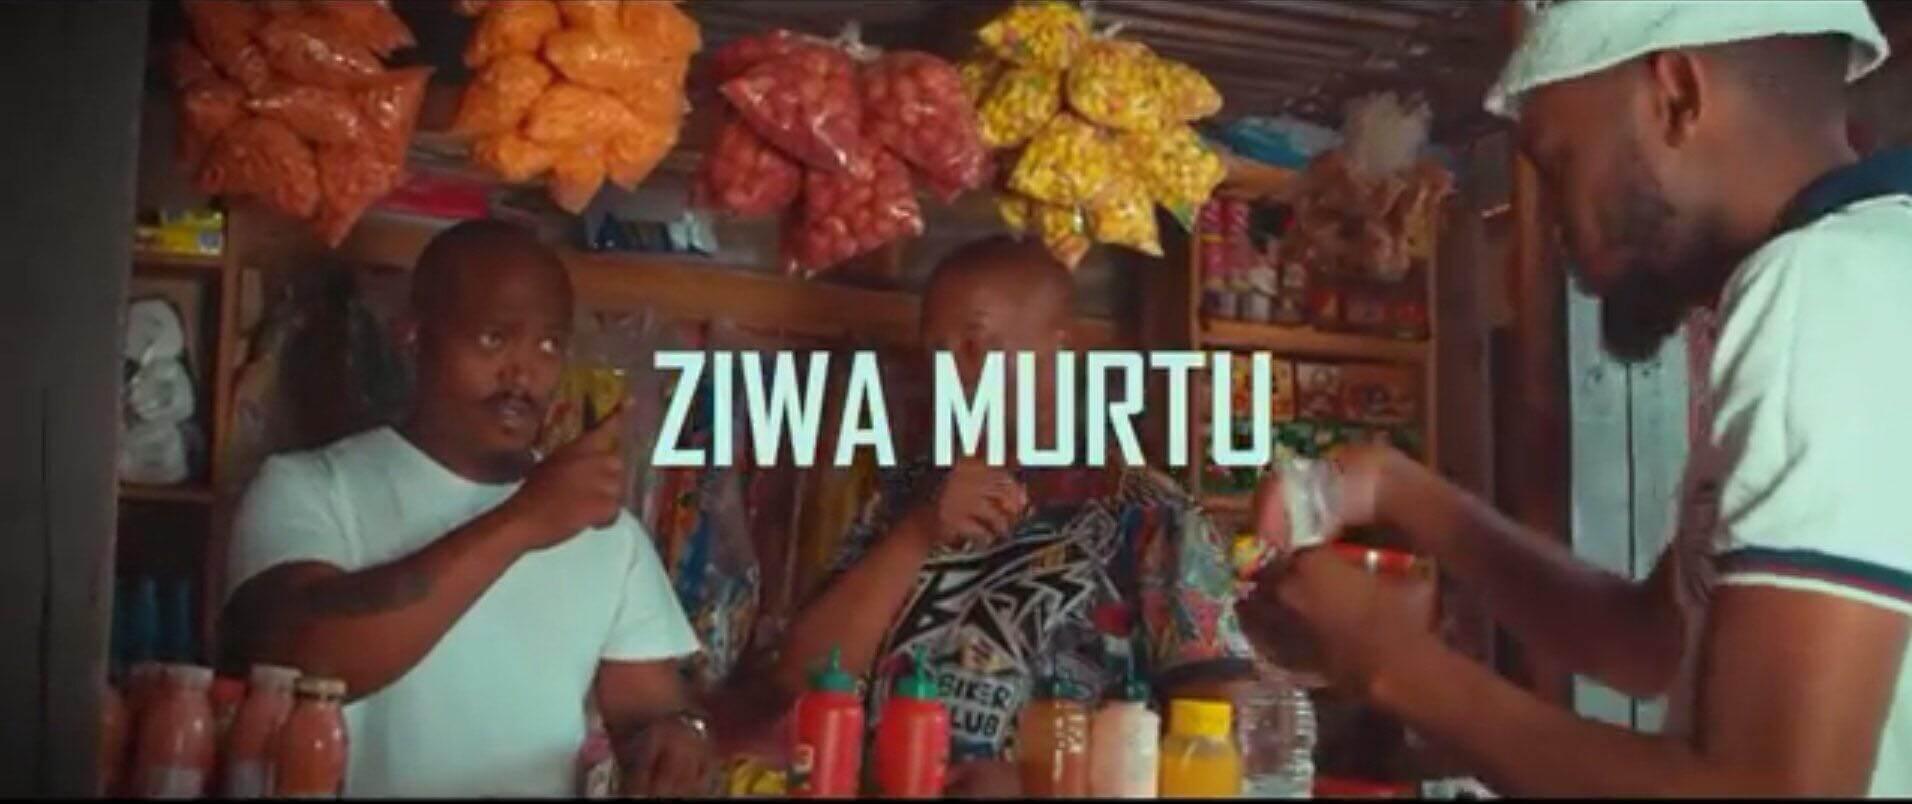 Ziwa Murtu ziwa murtu - Ziwa Murtu By DJ Vetkuk, Mahoota Featuring Kwesta